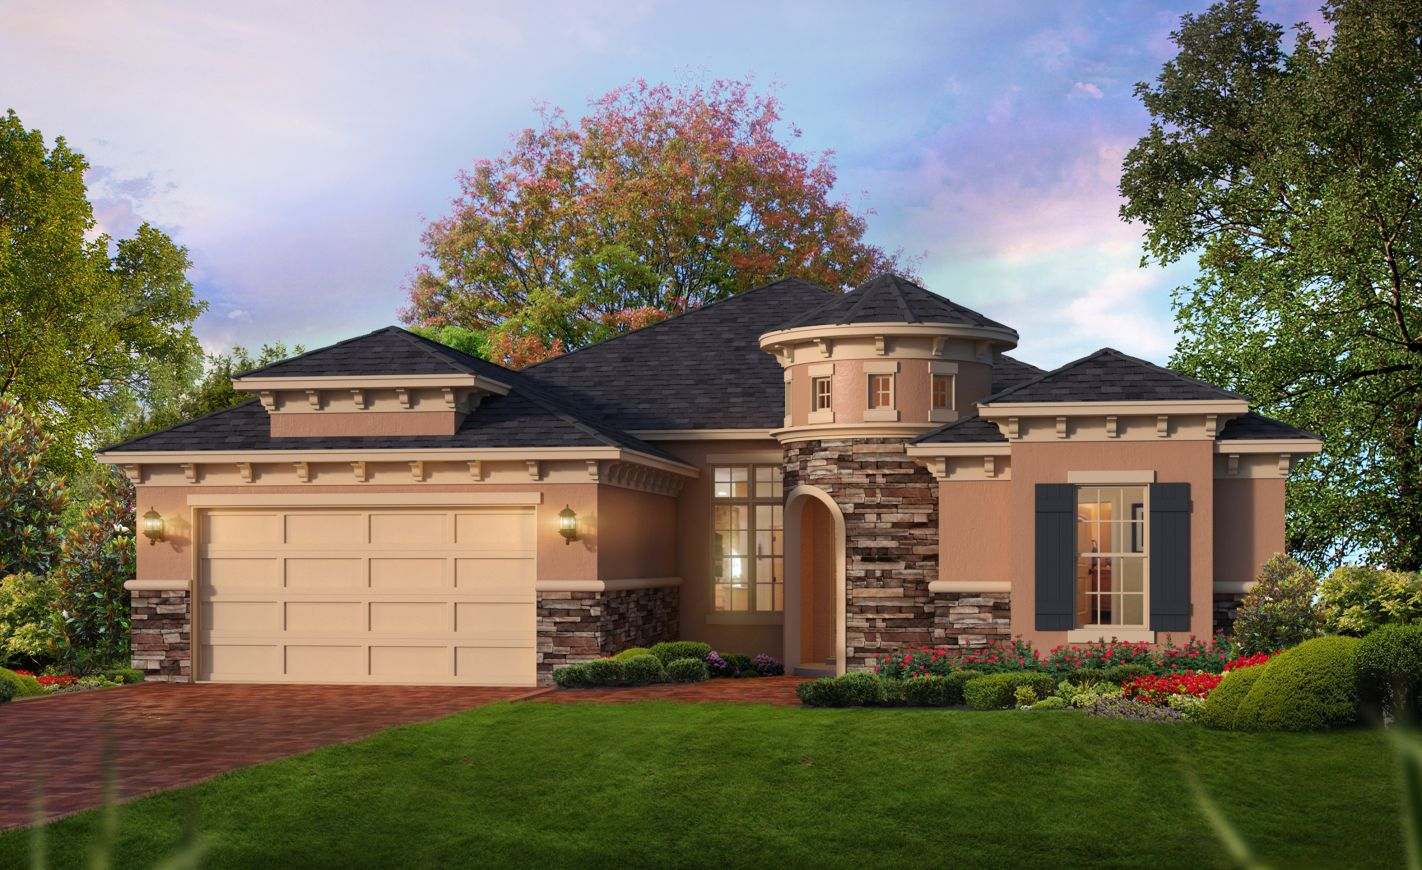 New Homes for Sale Ormond Beach FL - The Brandon at Plantation Bay